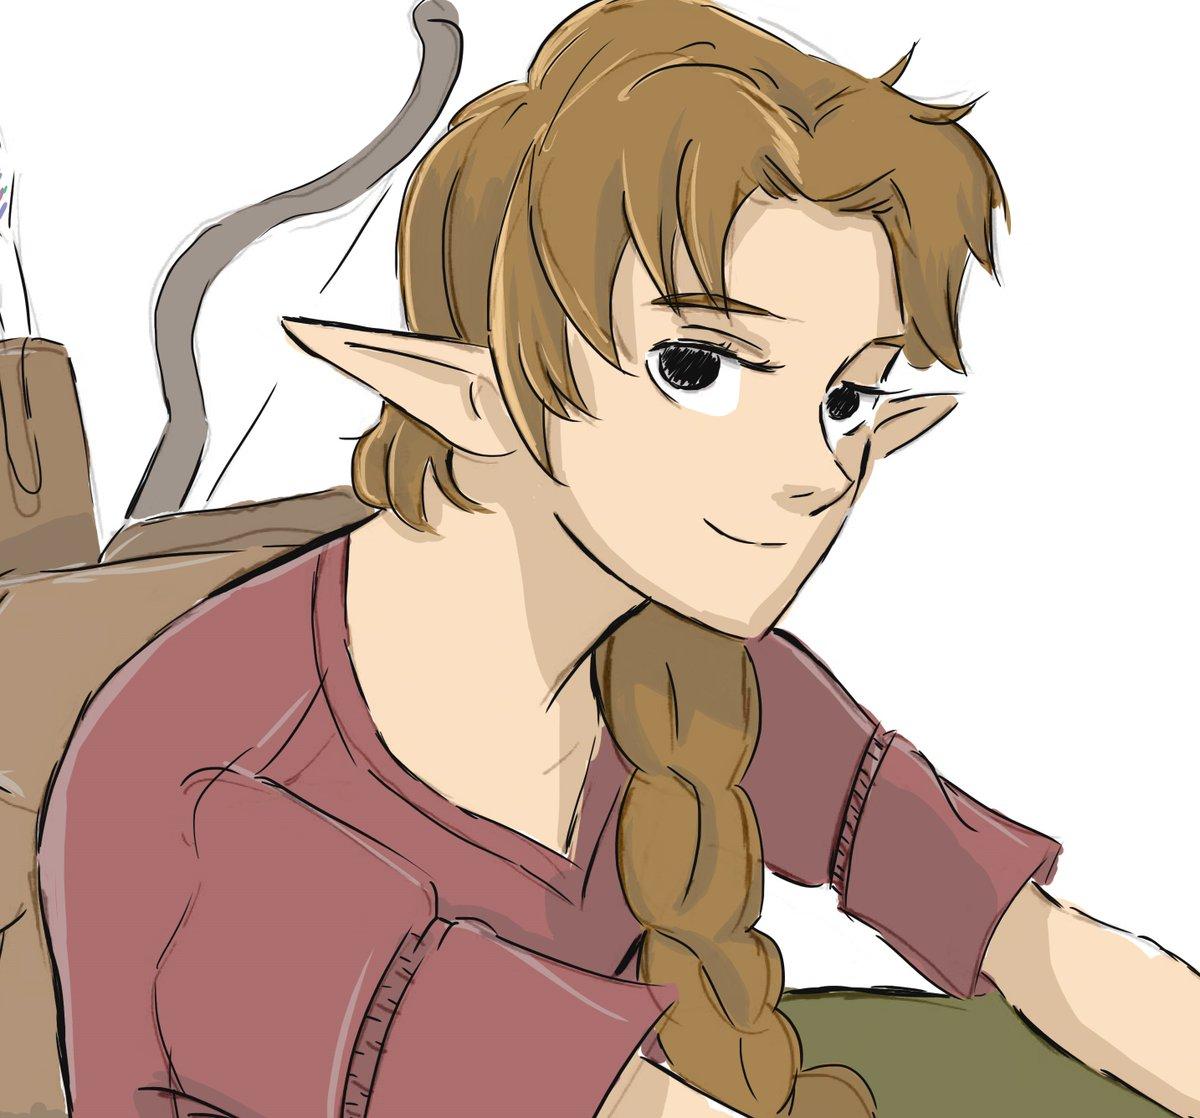 Archer Elf #desenho #ilustracao #ilustracion #ilustration #elf #drawing #brart #art #artistic #design<br>http://pic.twitter.com/CwogjZCw6M